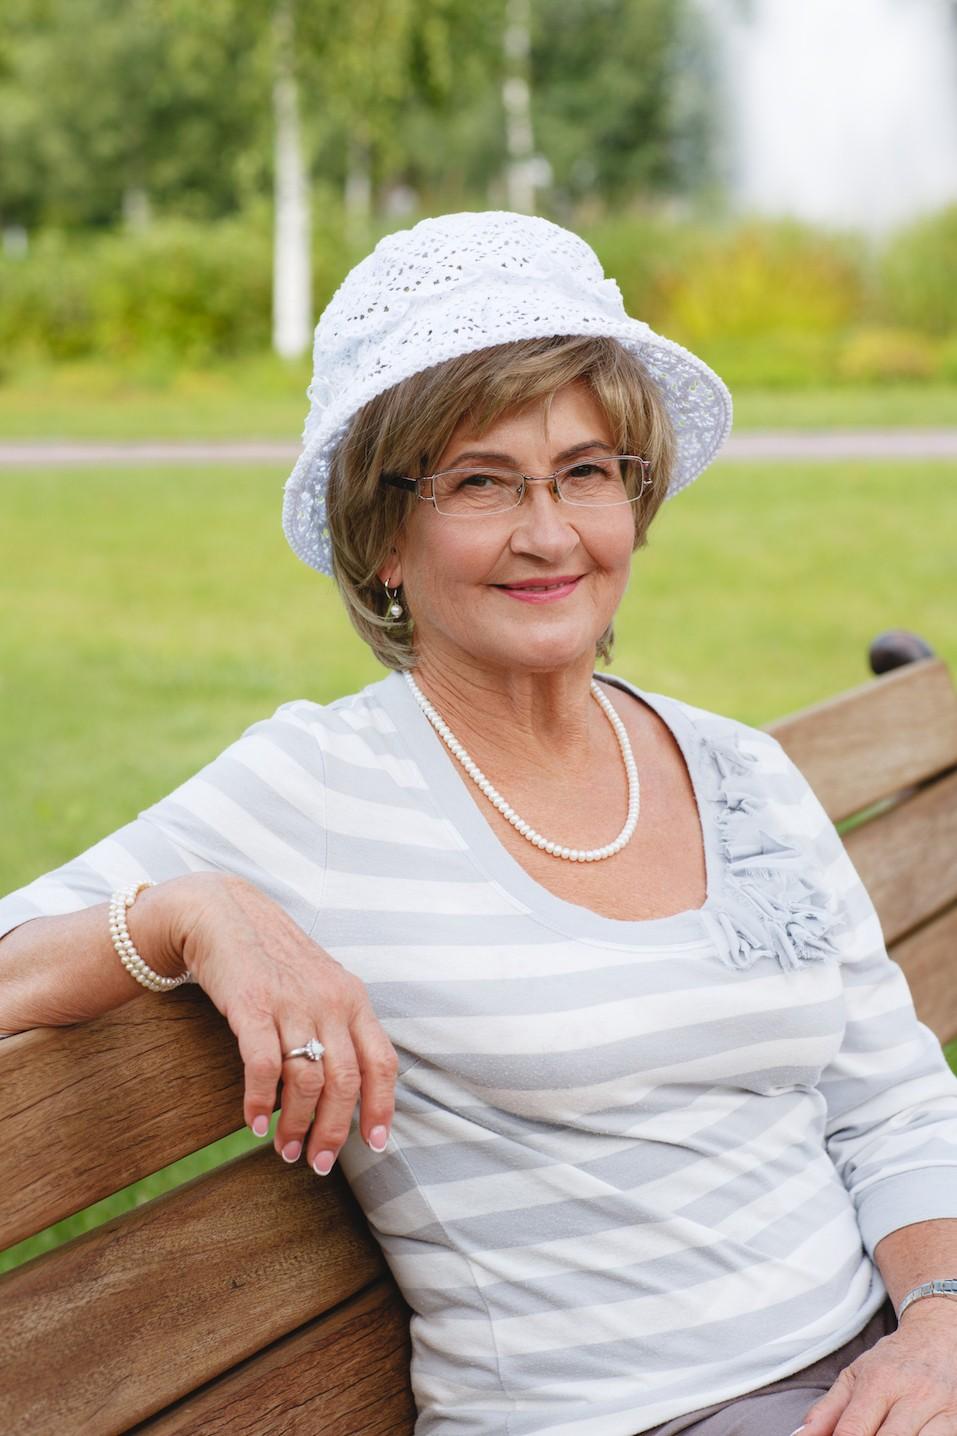 Happy senior woman sitting on a bench